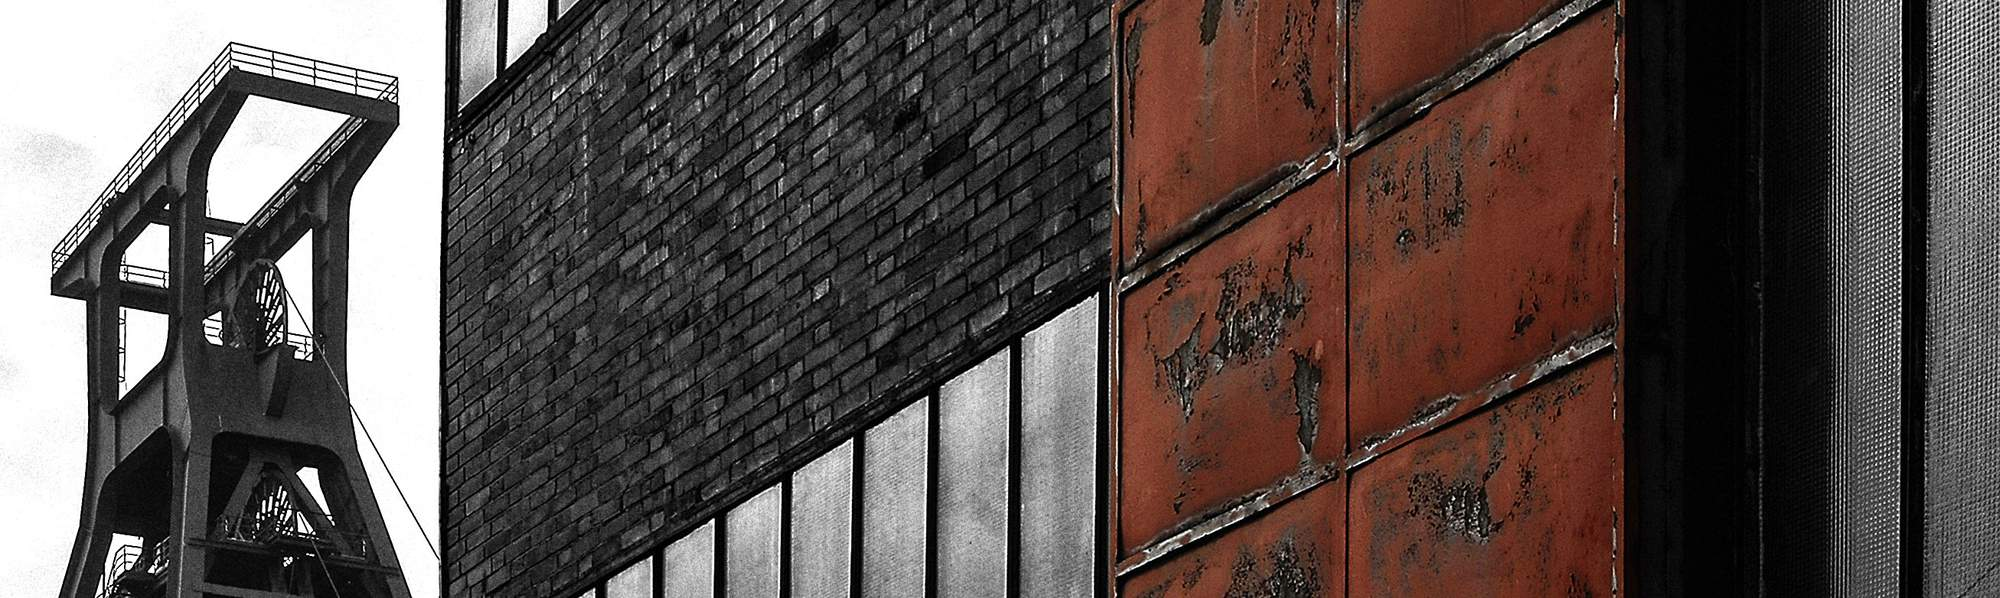 Förderturm der Zeche mit Gebäude